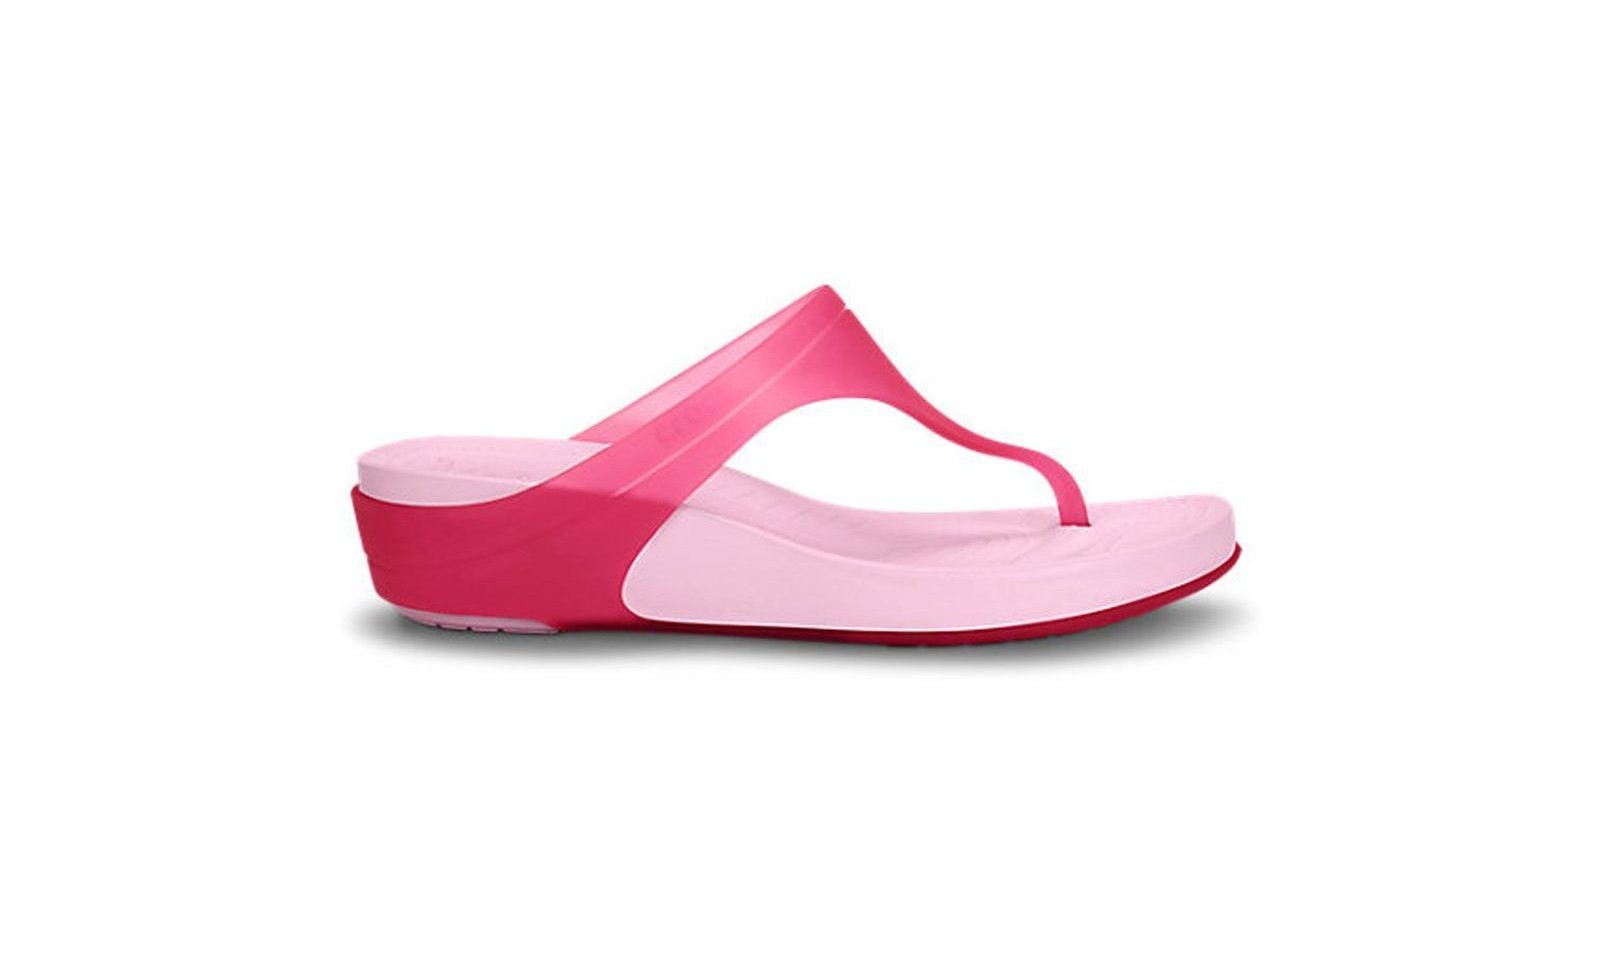 Flip Ii Infradito Zeppa Donna Platform Crocs Carlie Con v0w8mNn